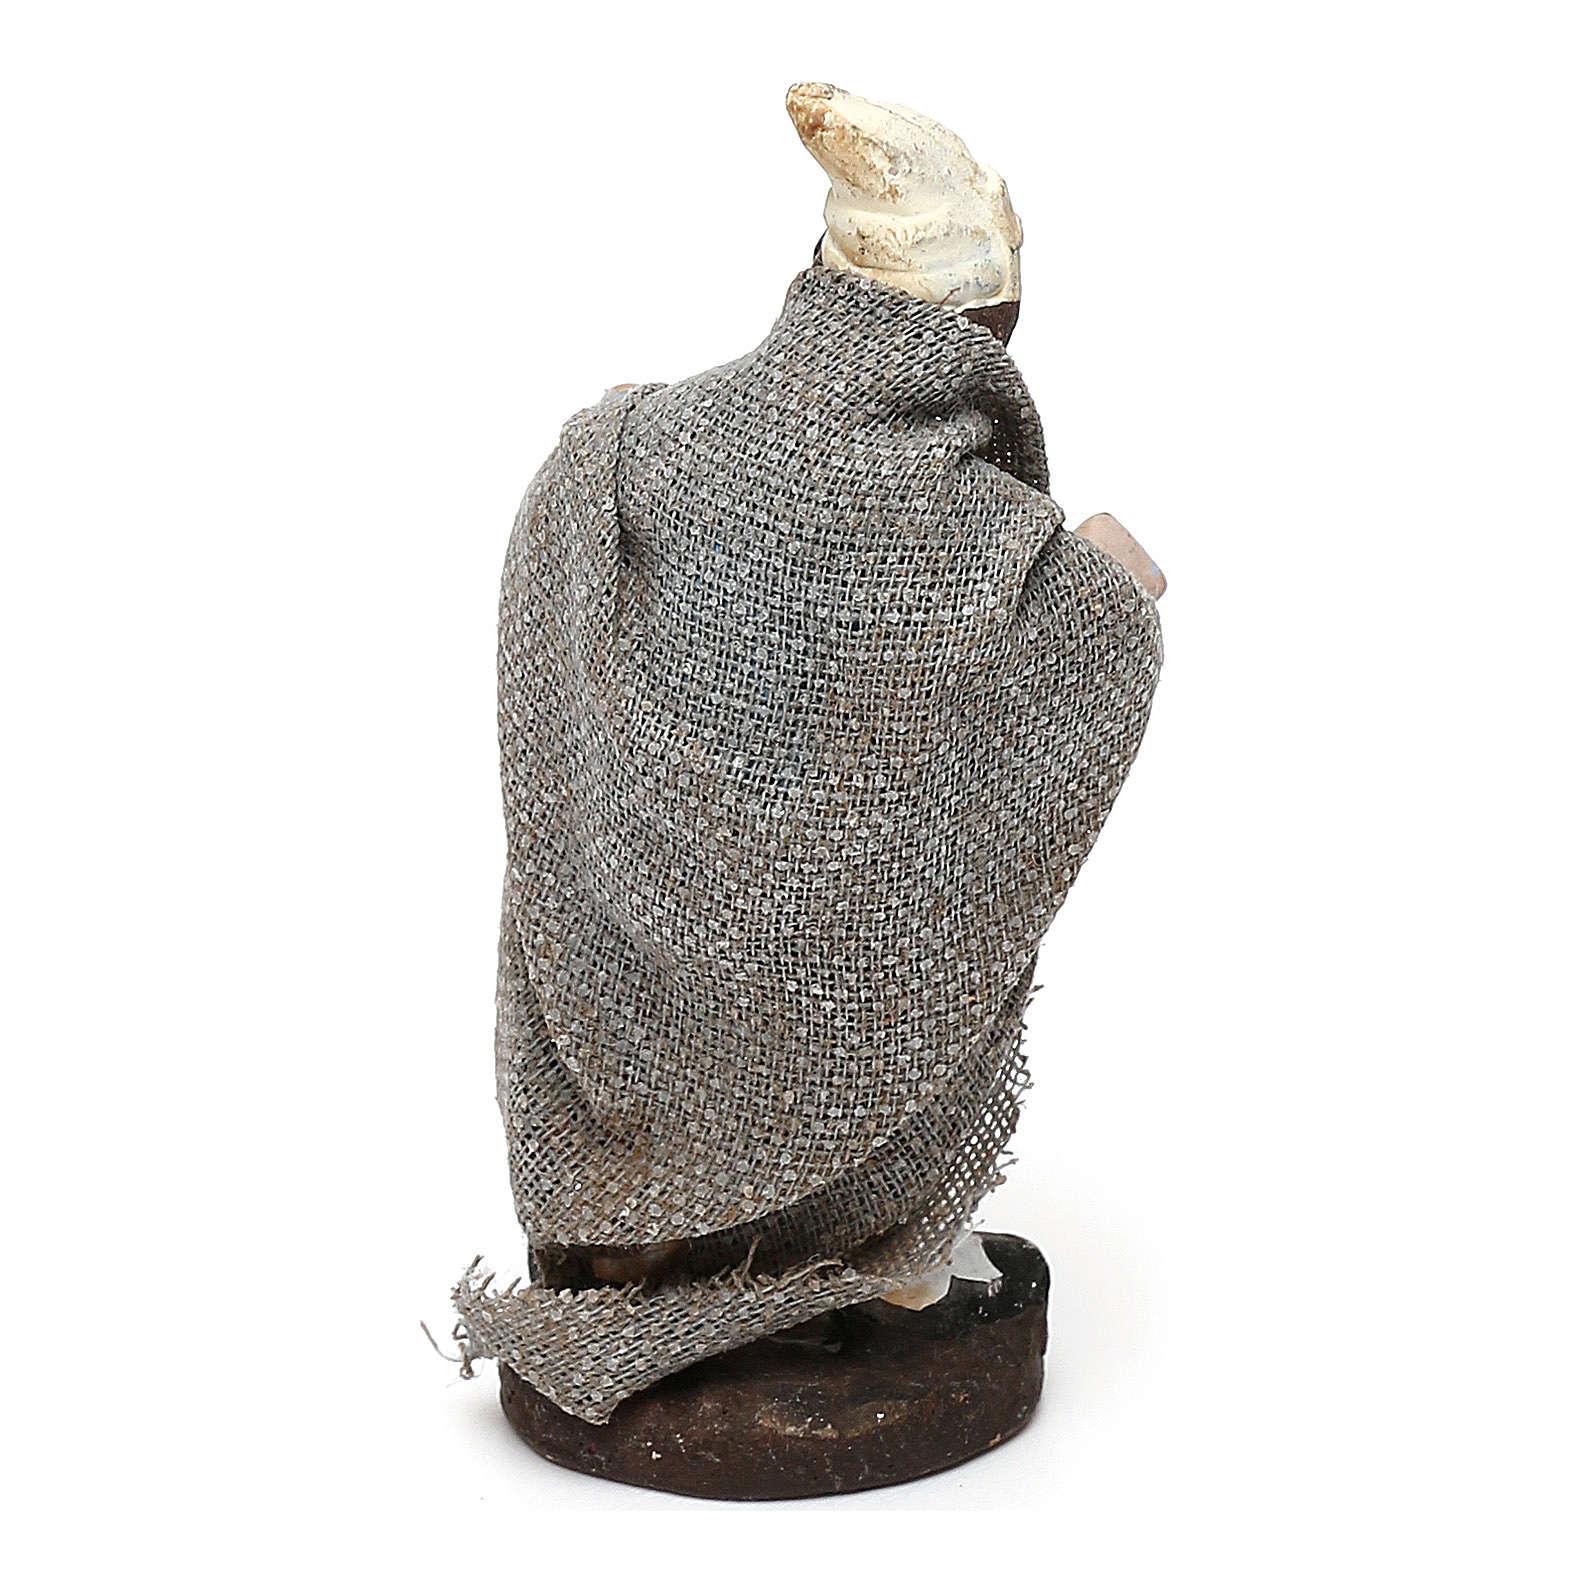 STOCK Pastore in terracotta vestito cm 4 per presepe Napoli 4